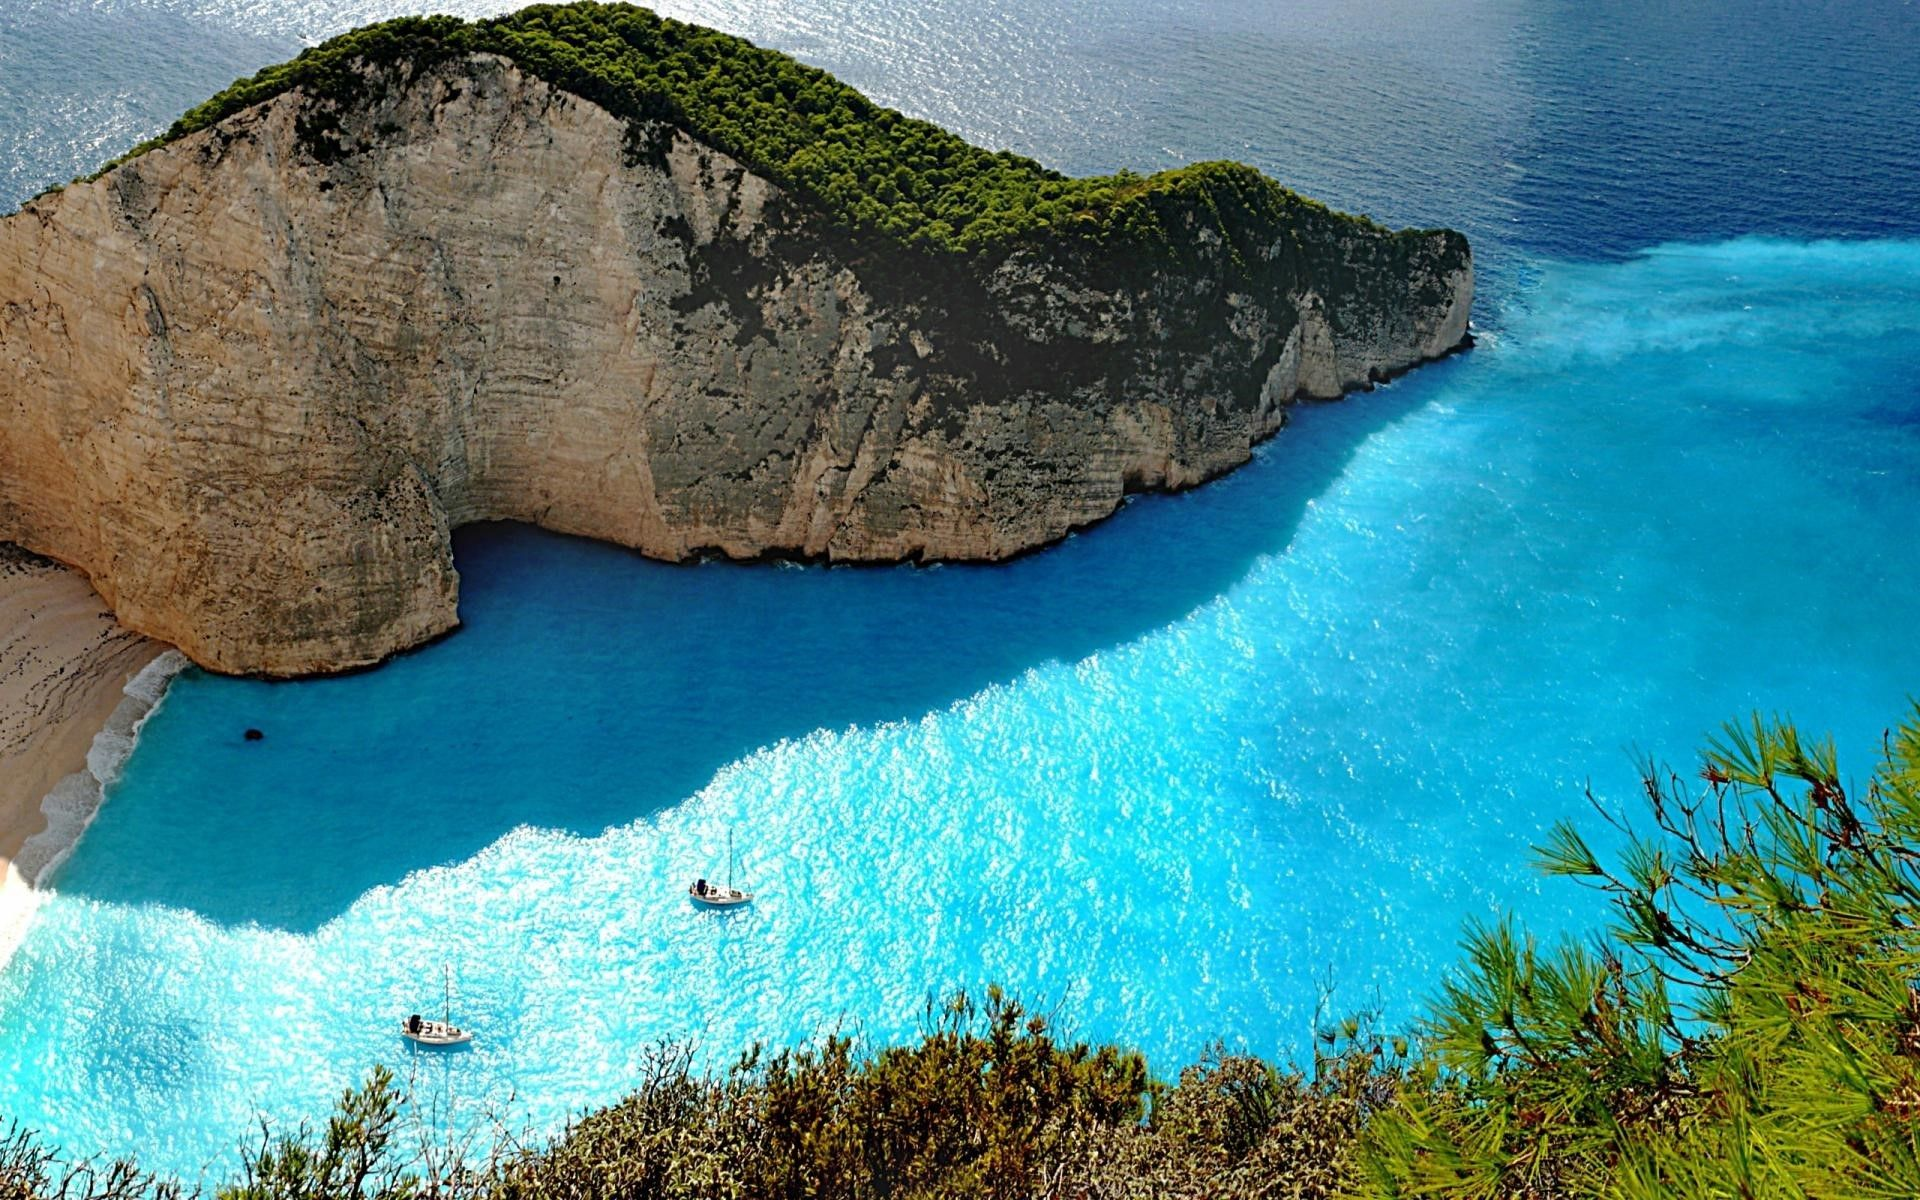 Zakynthos is a separate regional unit of the Ionian Islands region 1920x1200